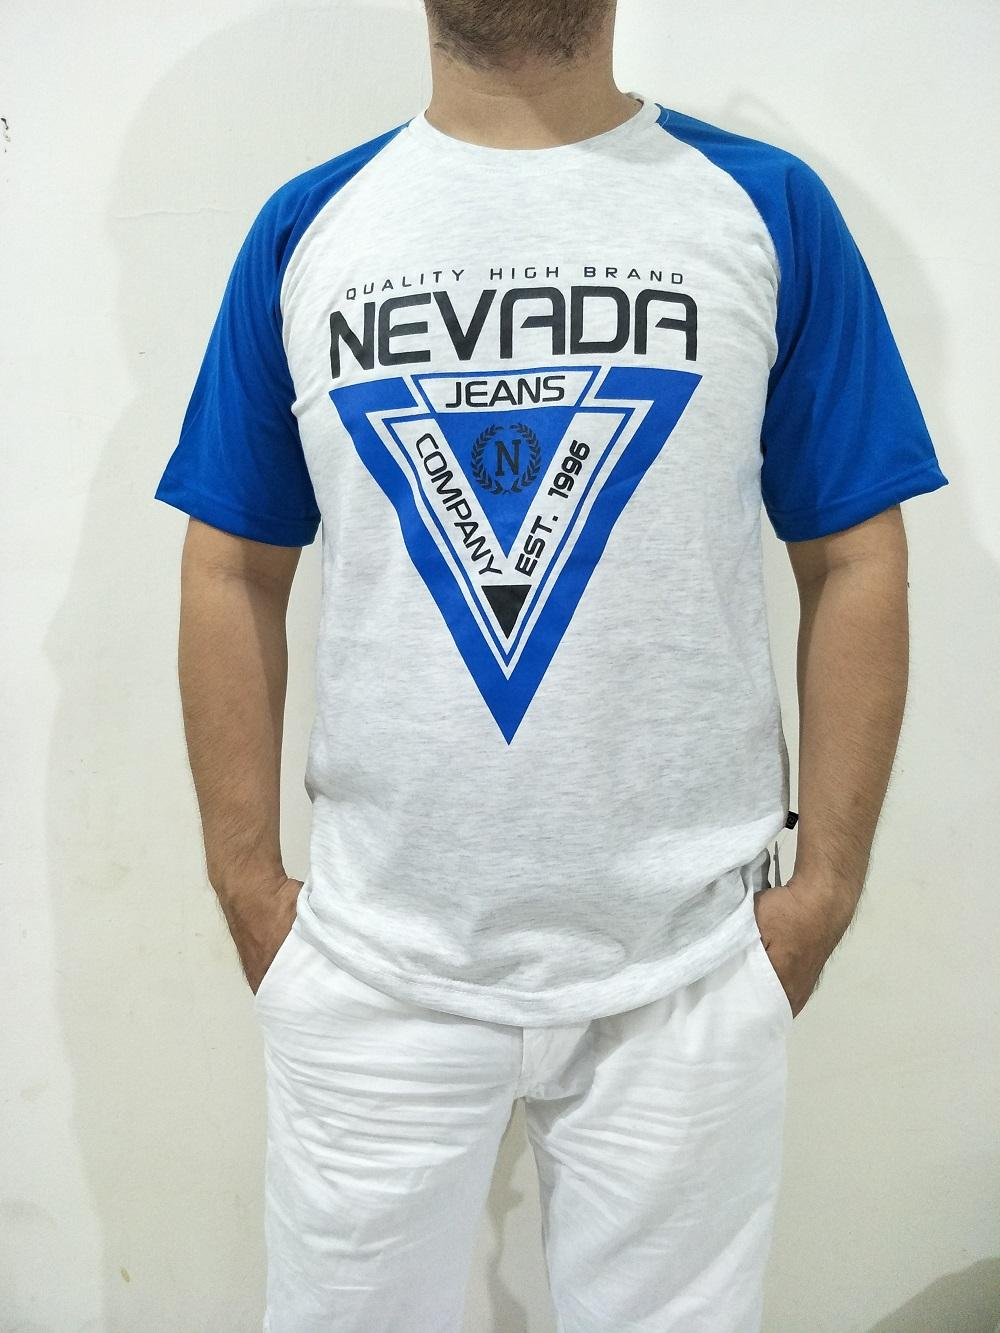 245 Kaos distro Nevada premium Quality TSHIRT PRIA / RAGLAN / KAOS PRIA / KAOS BRANDED ORIGINAL MATAHARI